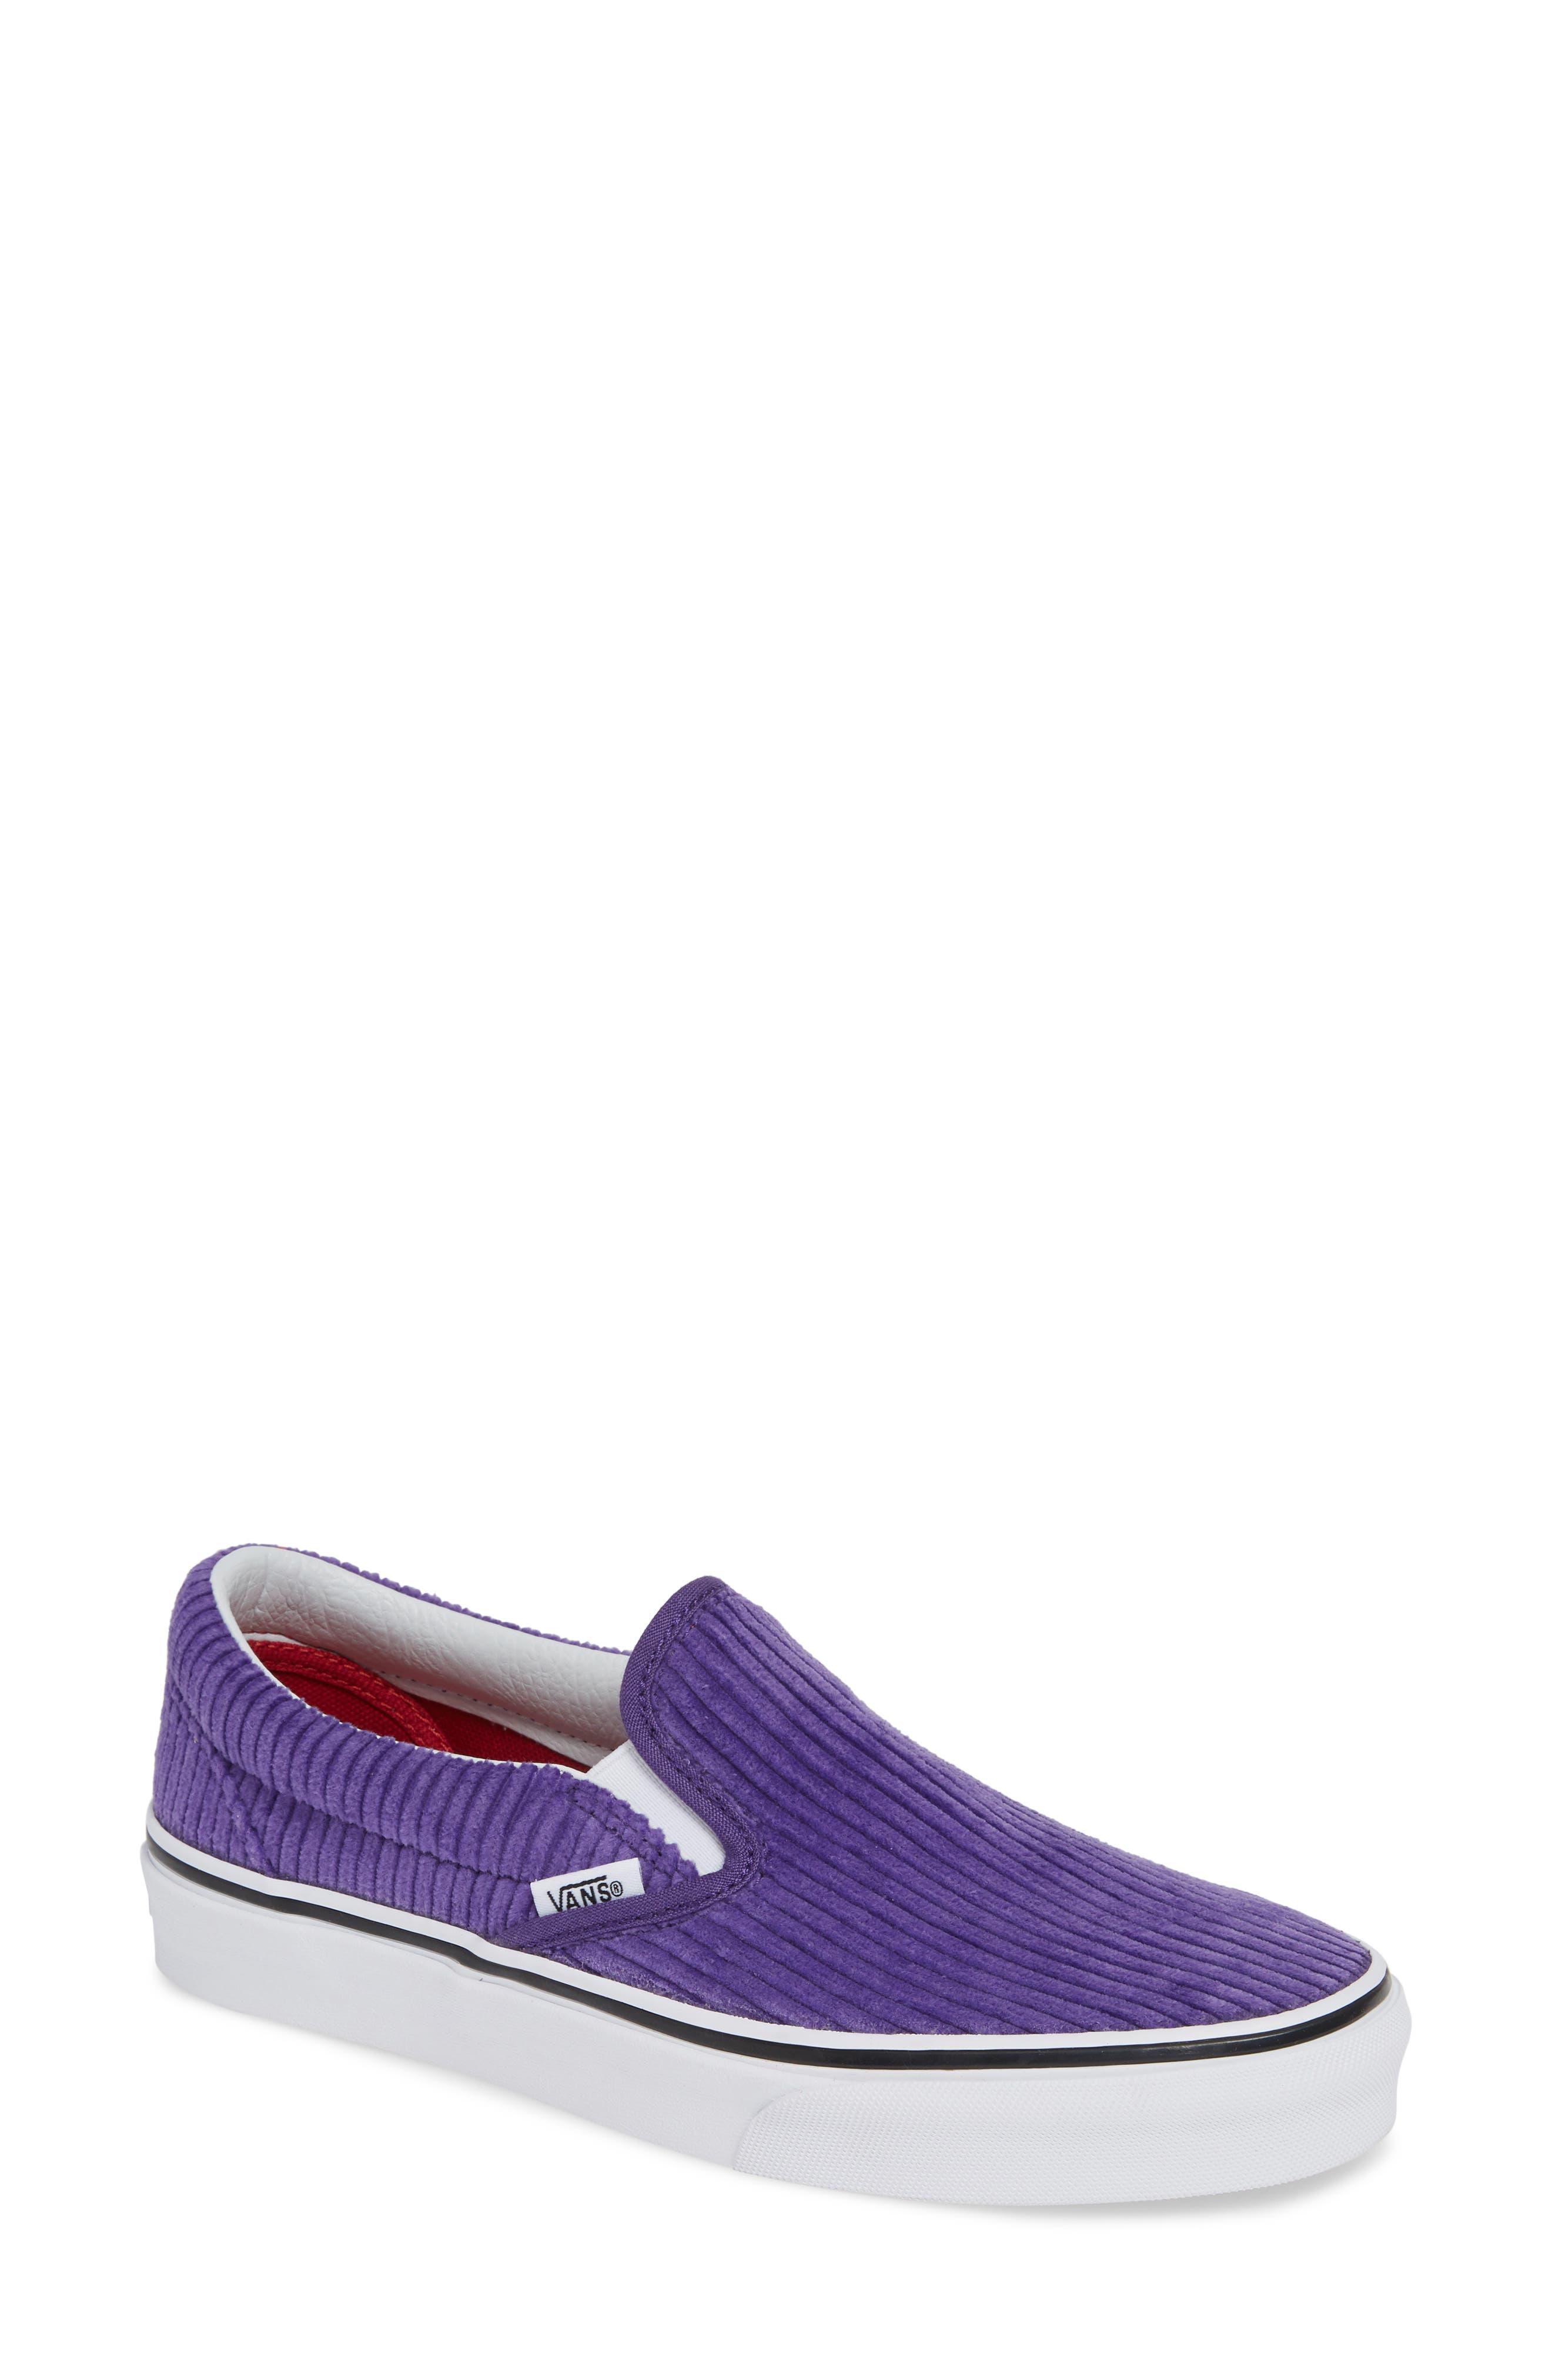 VANS,                             Classic Design Assembly Slip-On Sneaker,                             Main thumbnail 1, color,                             501